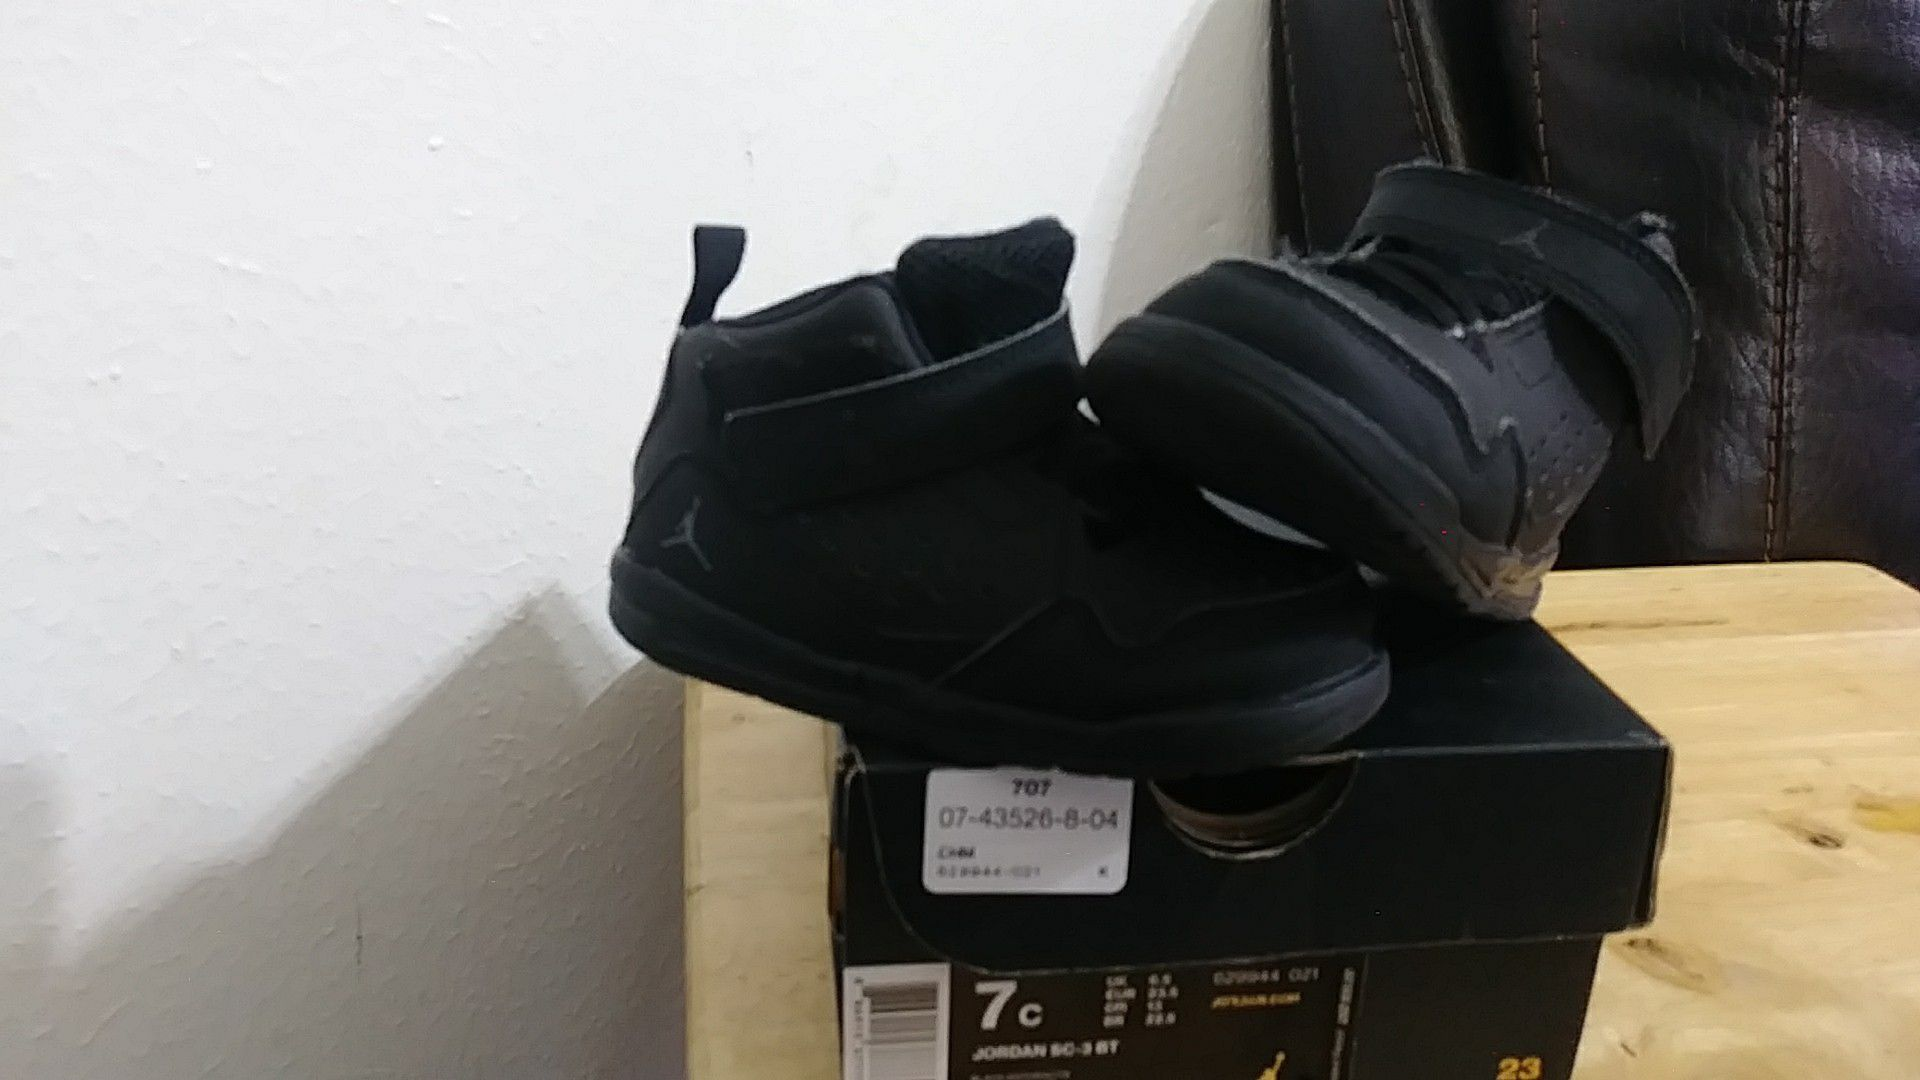 Jordan 7c